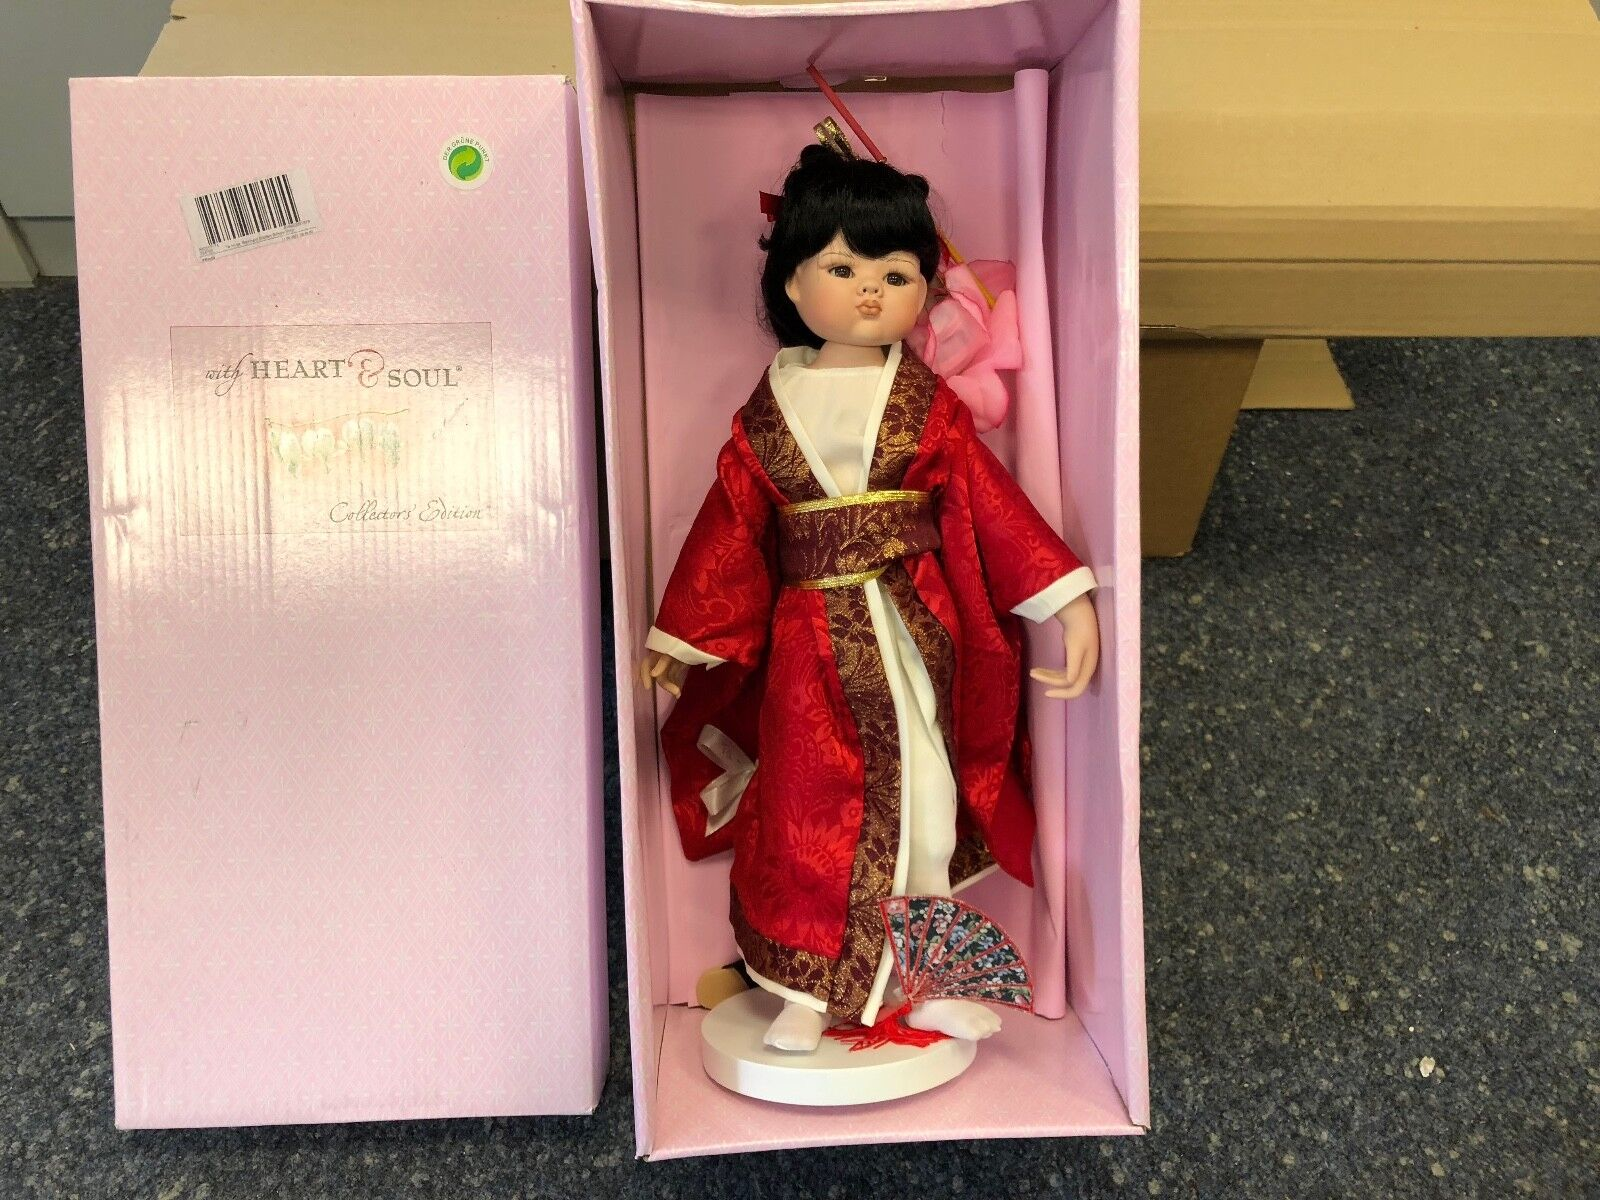 Linda M. Beitz bambola di porcellana 47 CM. OTTIMO stato